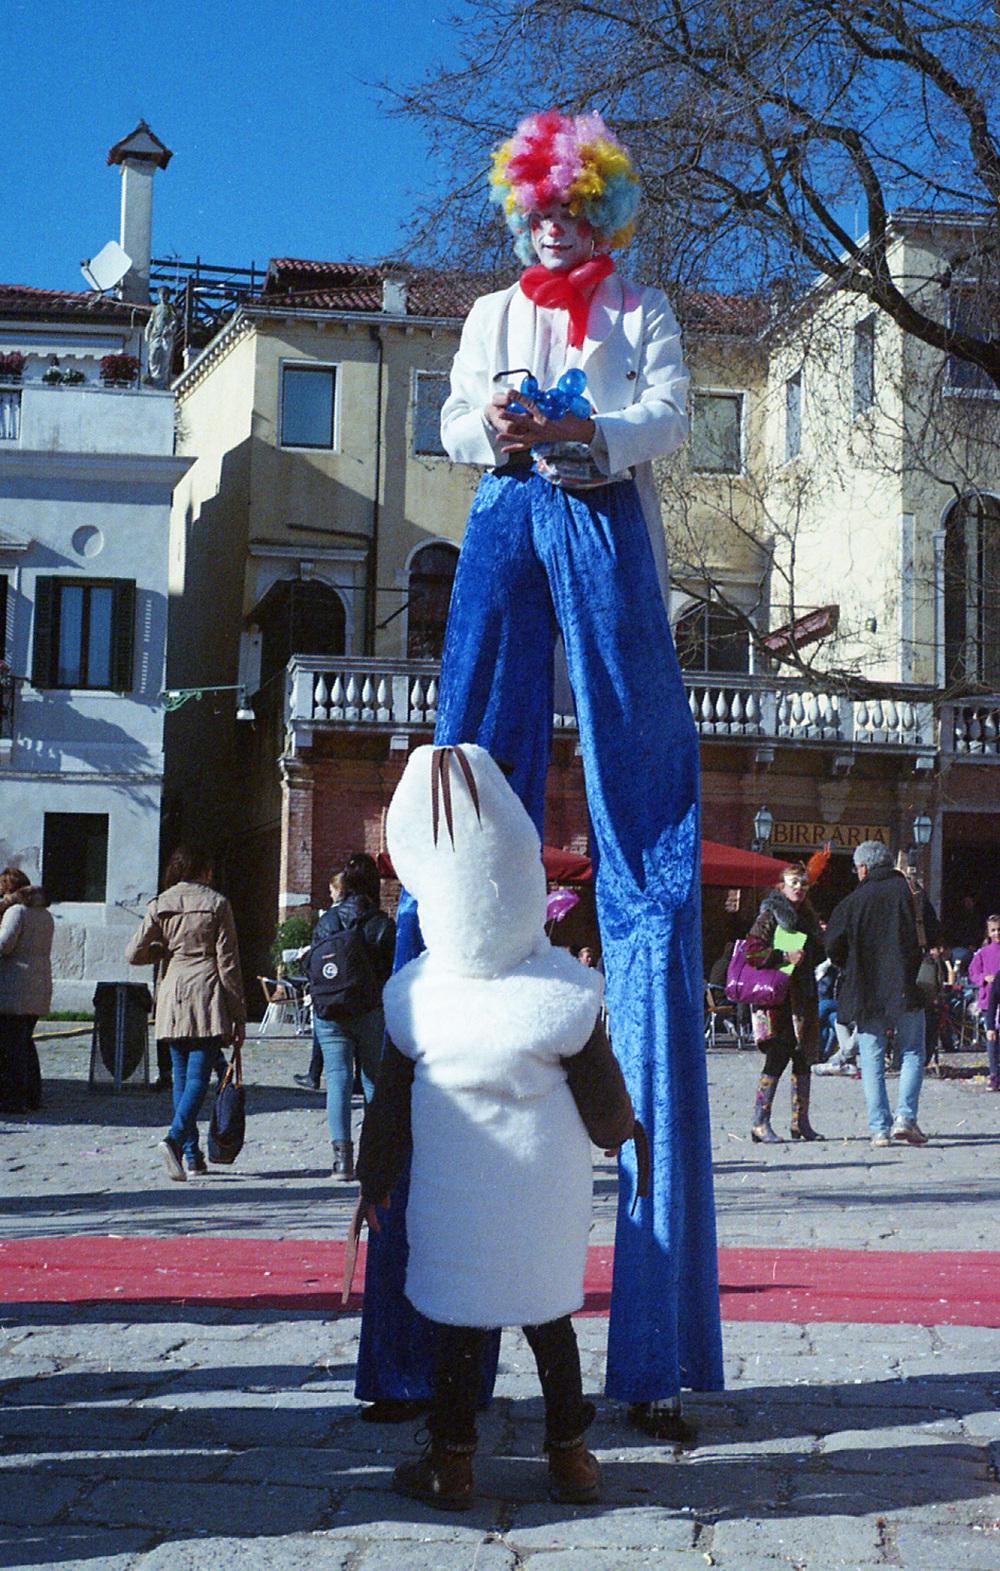 Carnevale, Venice, Italy